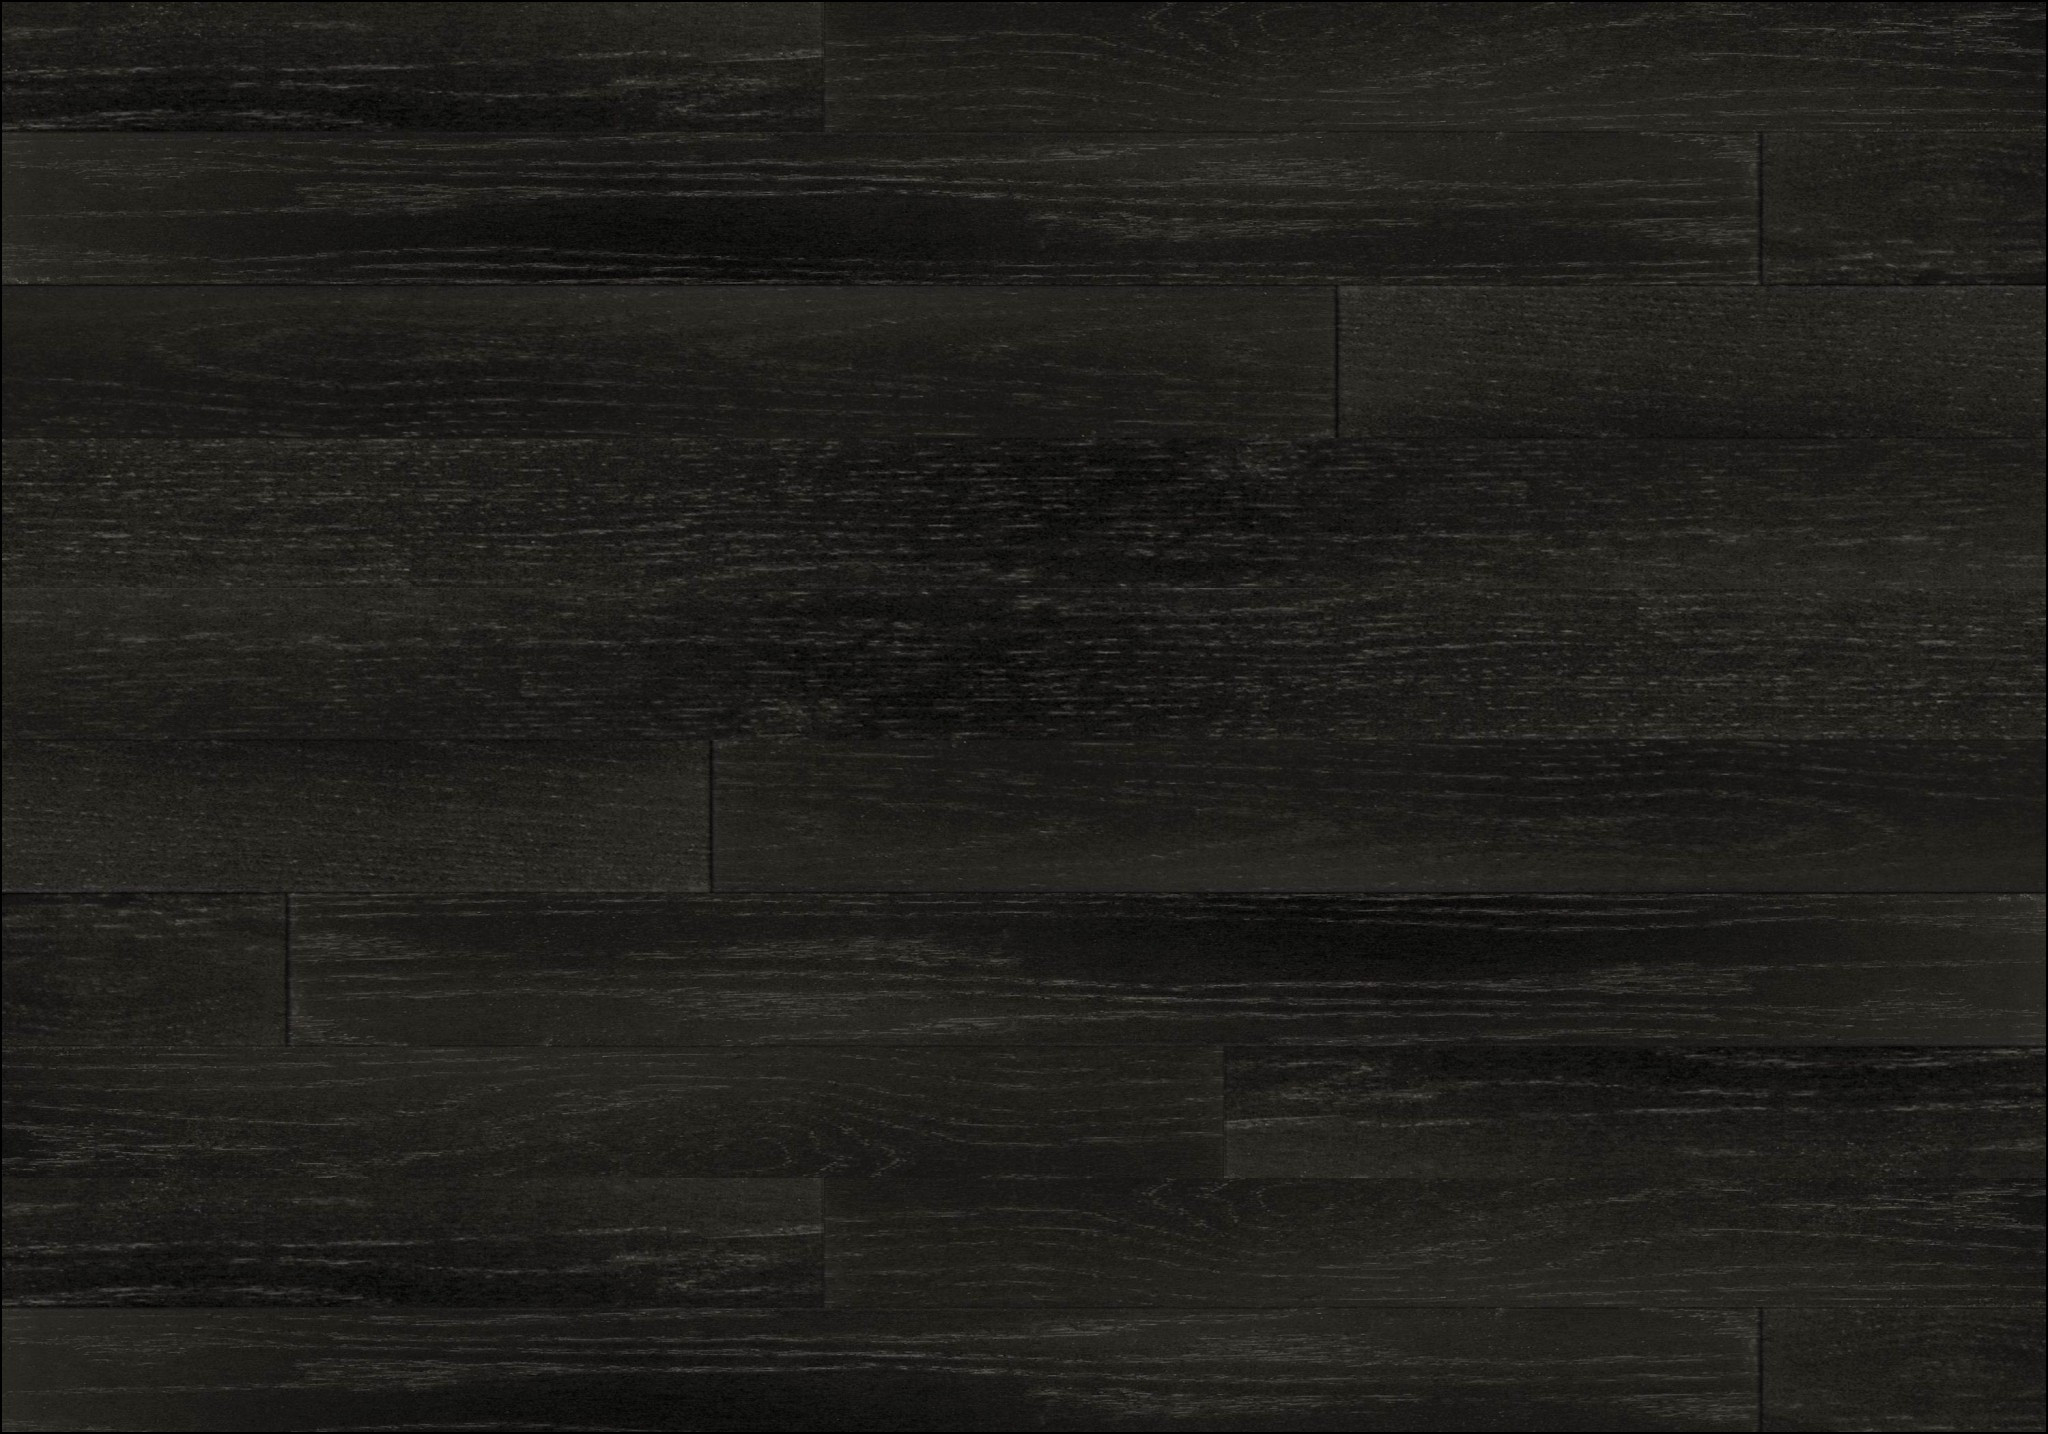 hardwood floor refinishing fargo nd of hardwood flooring suppliers france flooring ideas intended for hardwood flooring cost for 1000 square feet stock articles rippnfinish hardwood floor refinishing of hardwood